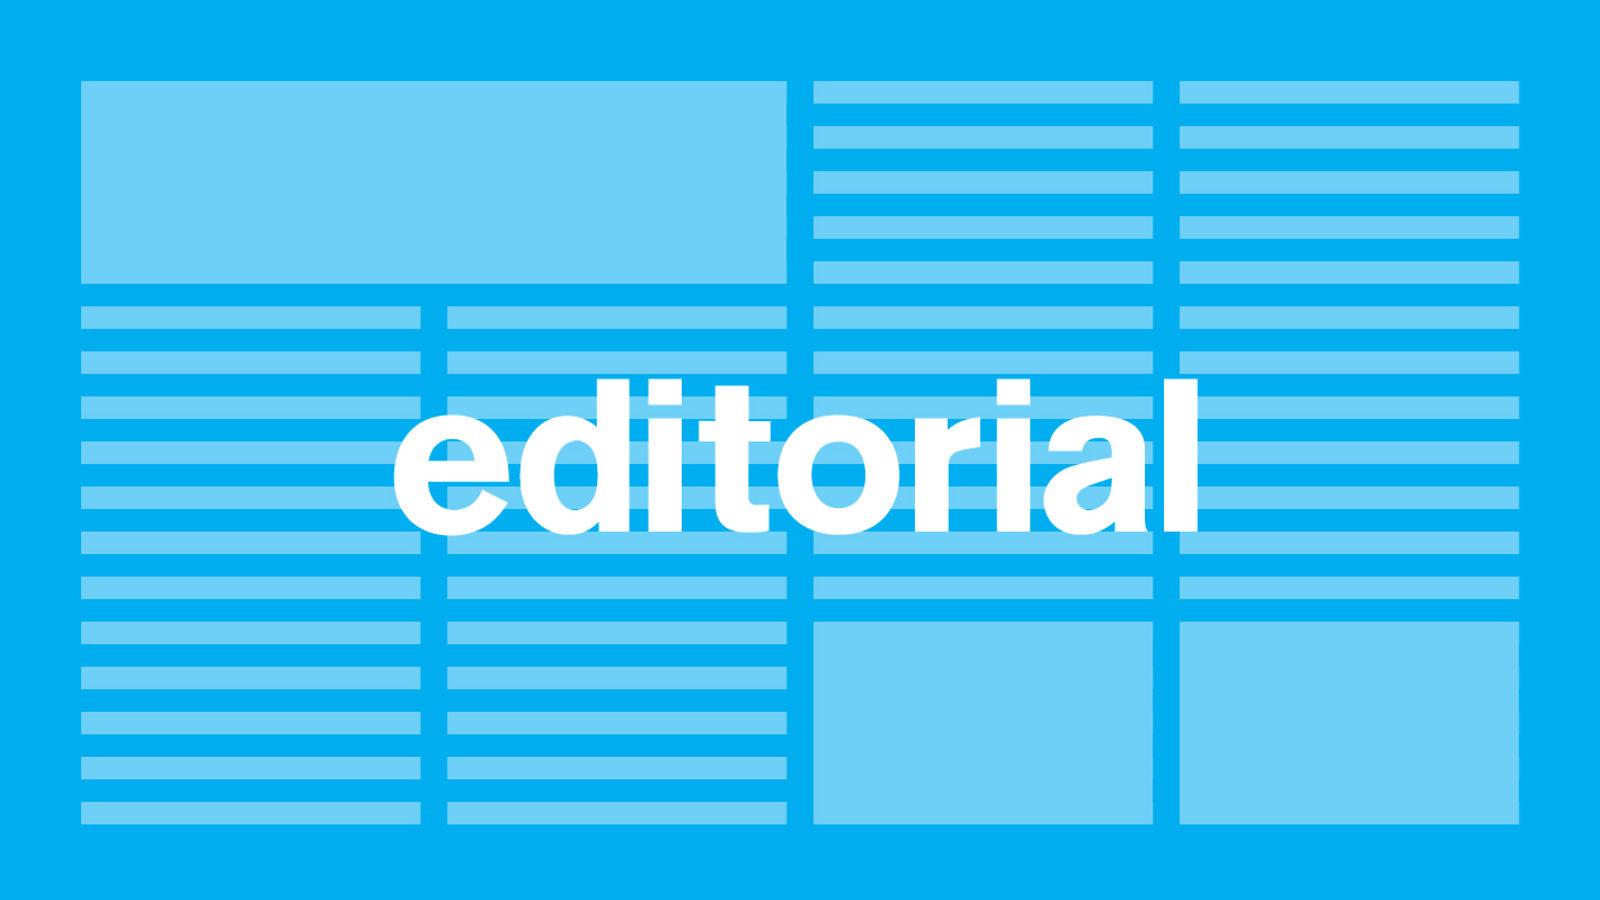 Editorial: Generic Header